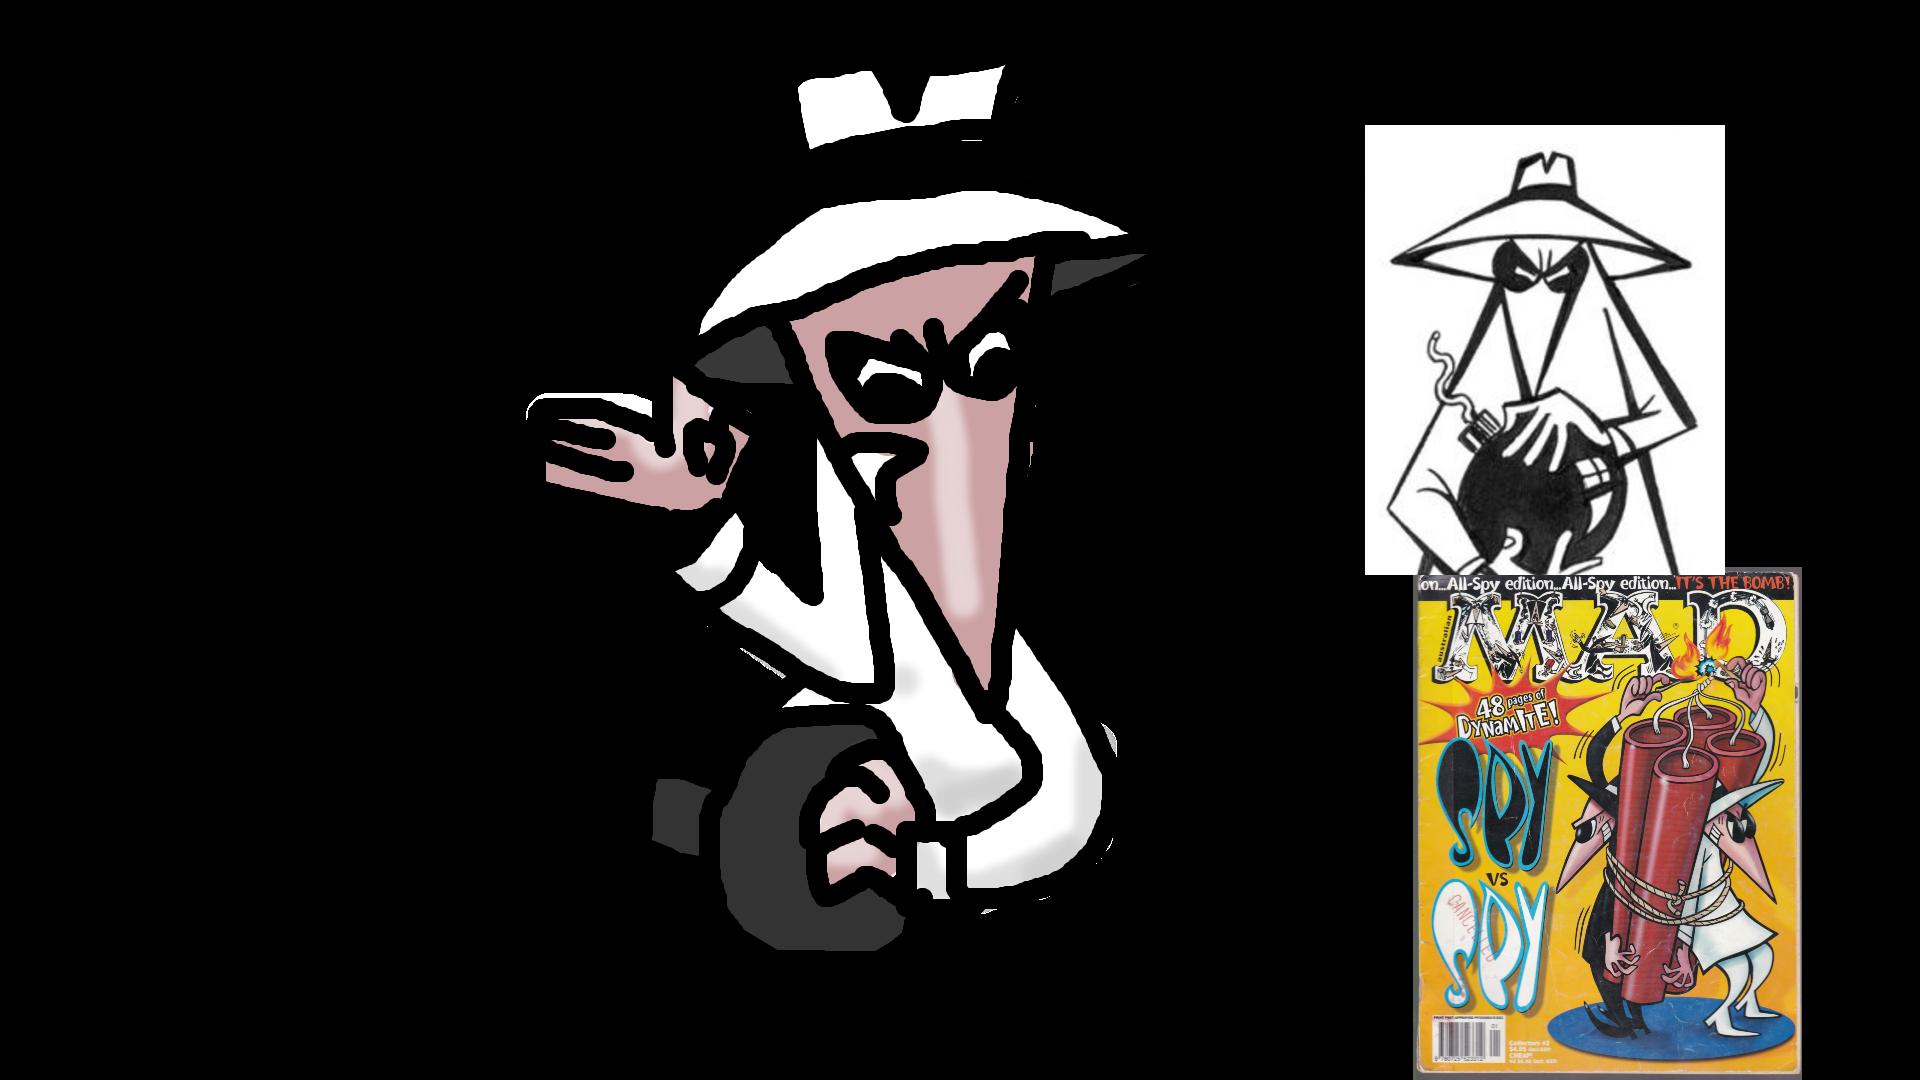 White Spy (again)